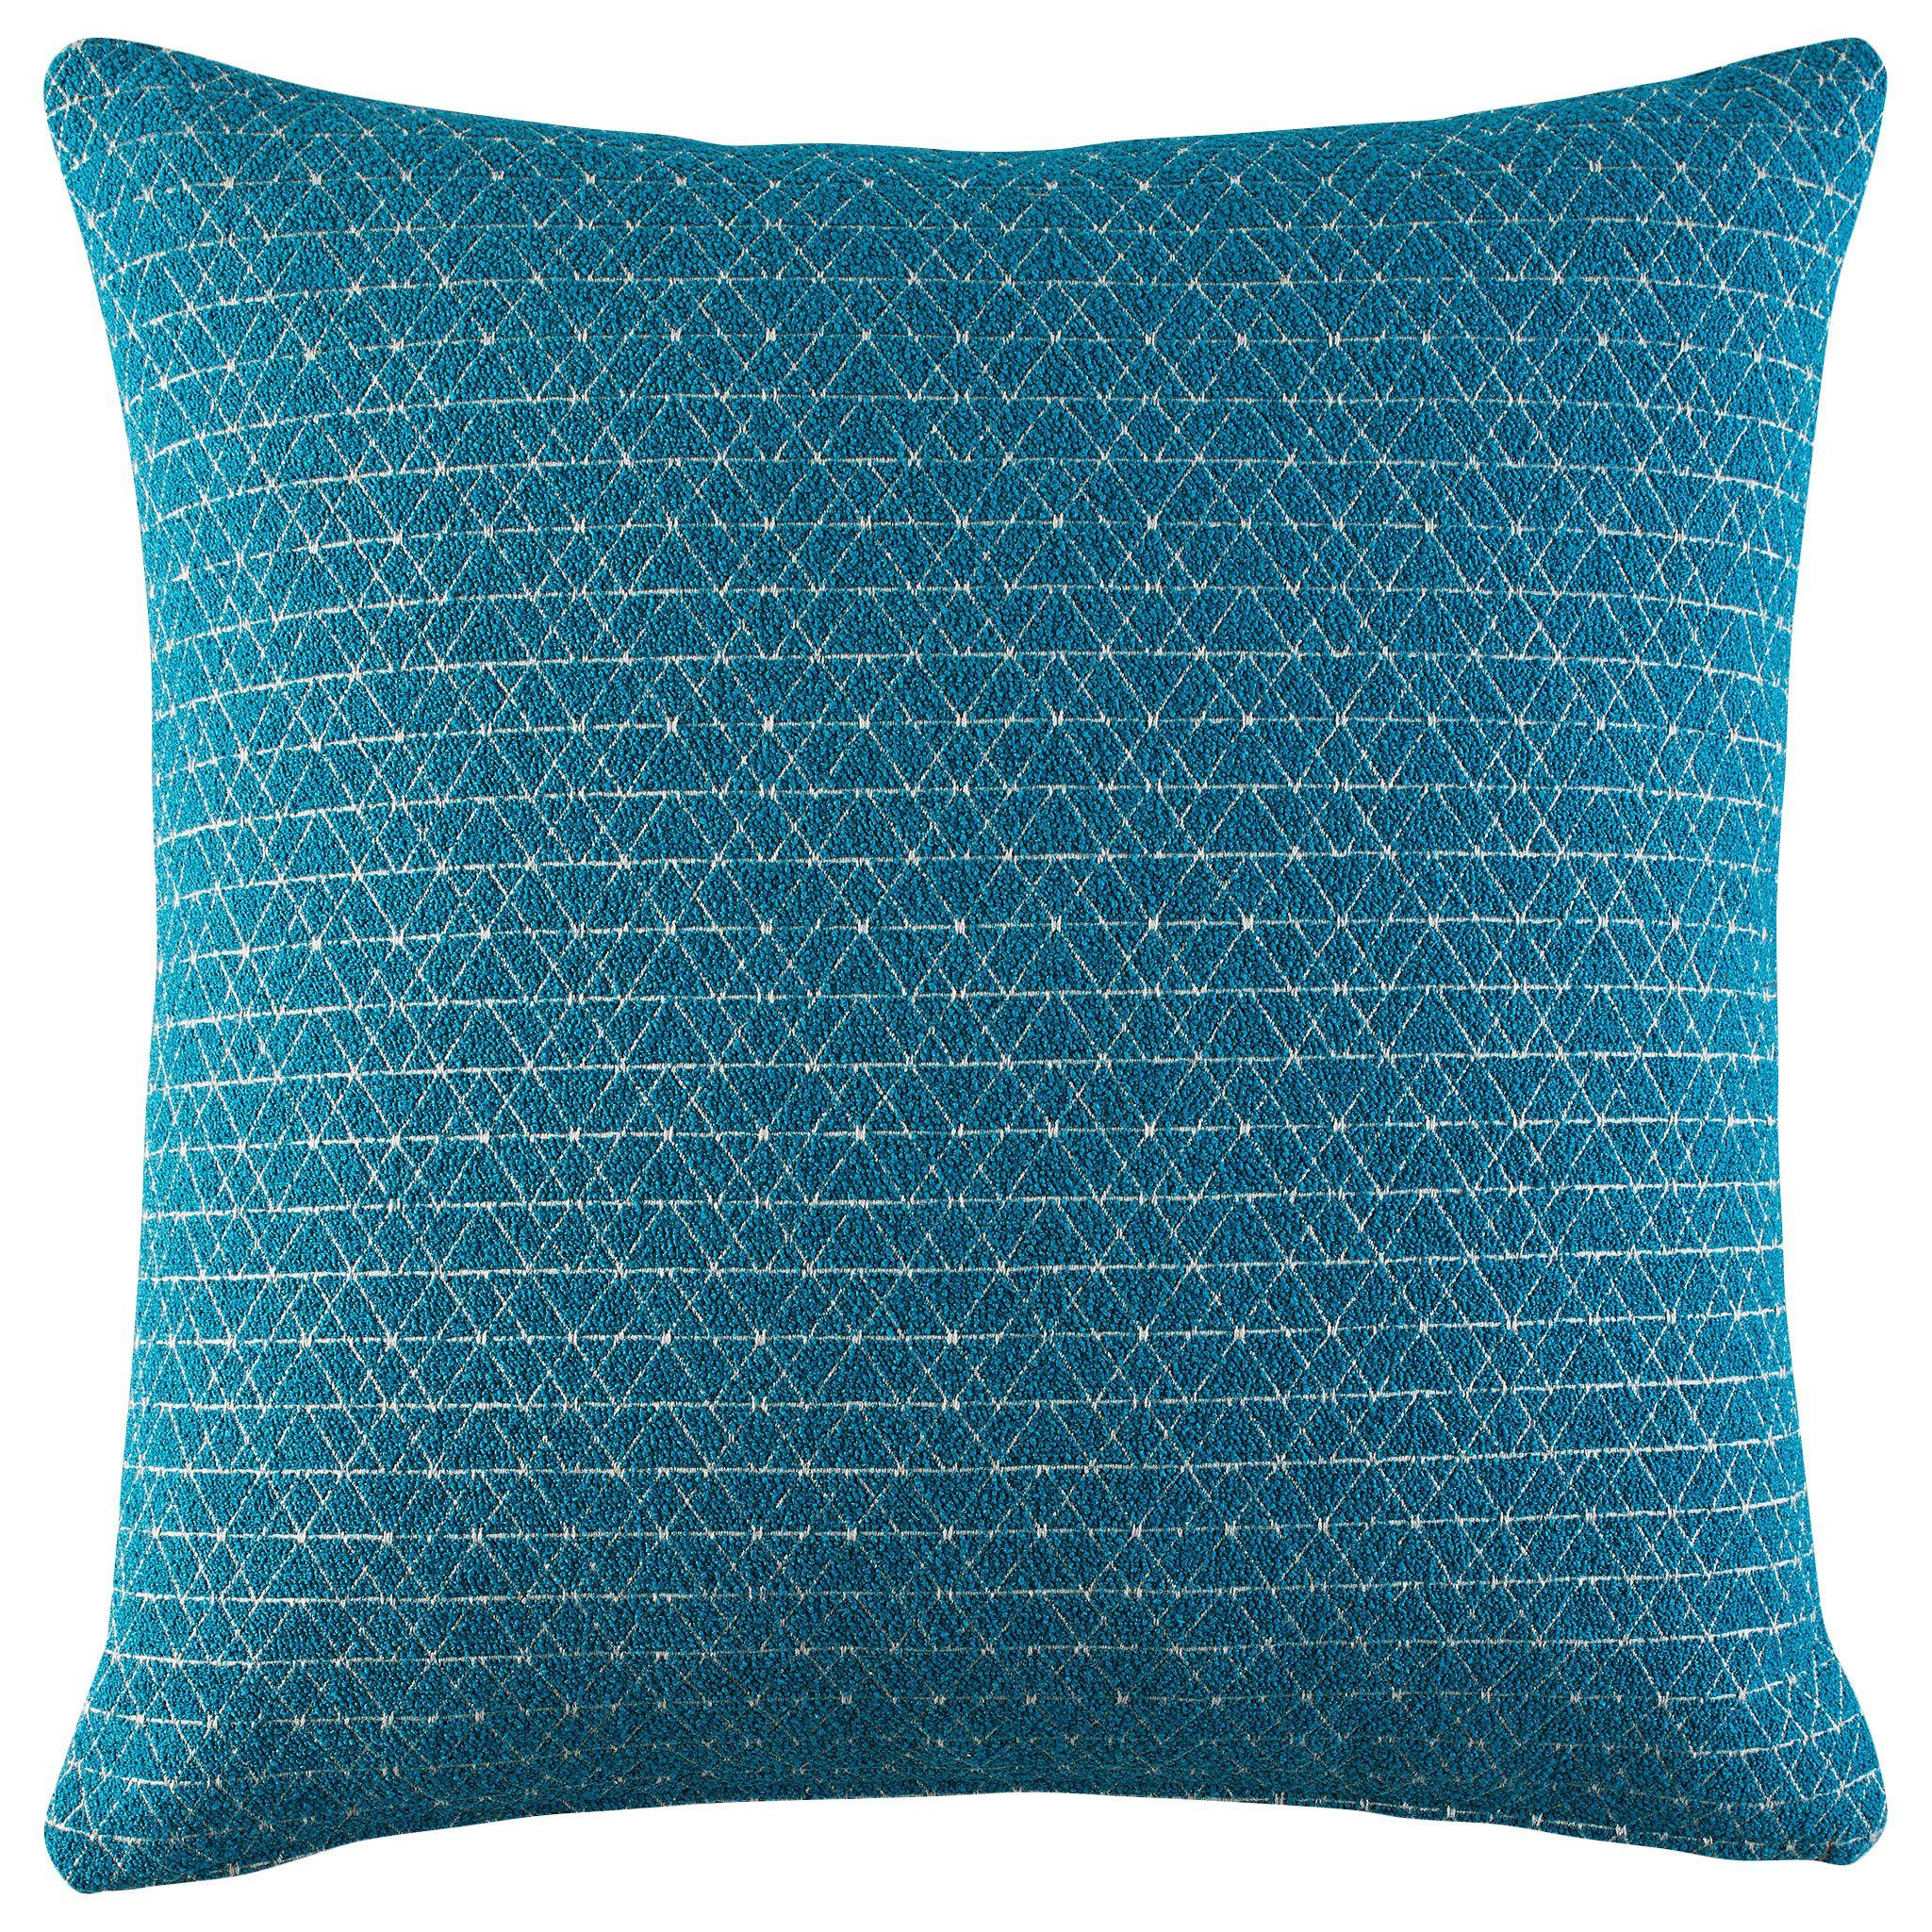 G Plan Vintage G Plan Vintage Scatter Cushion, Cosmic Teal